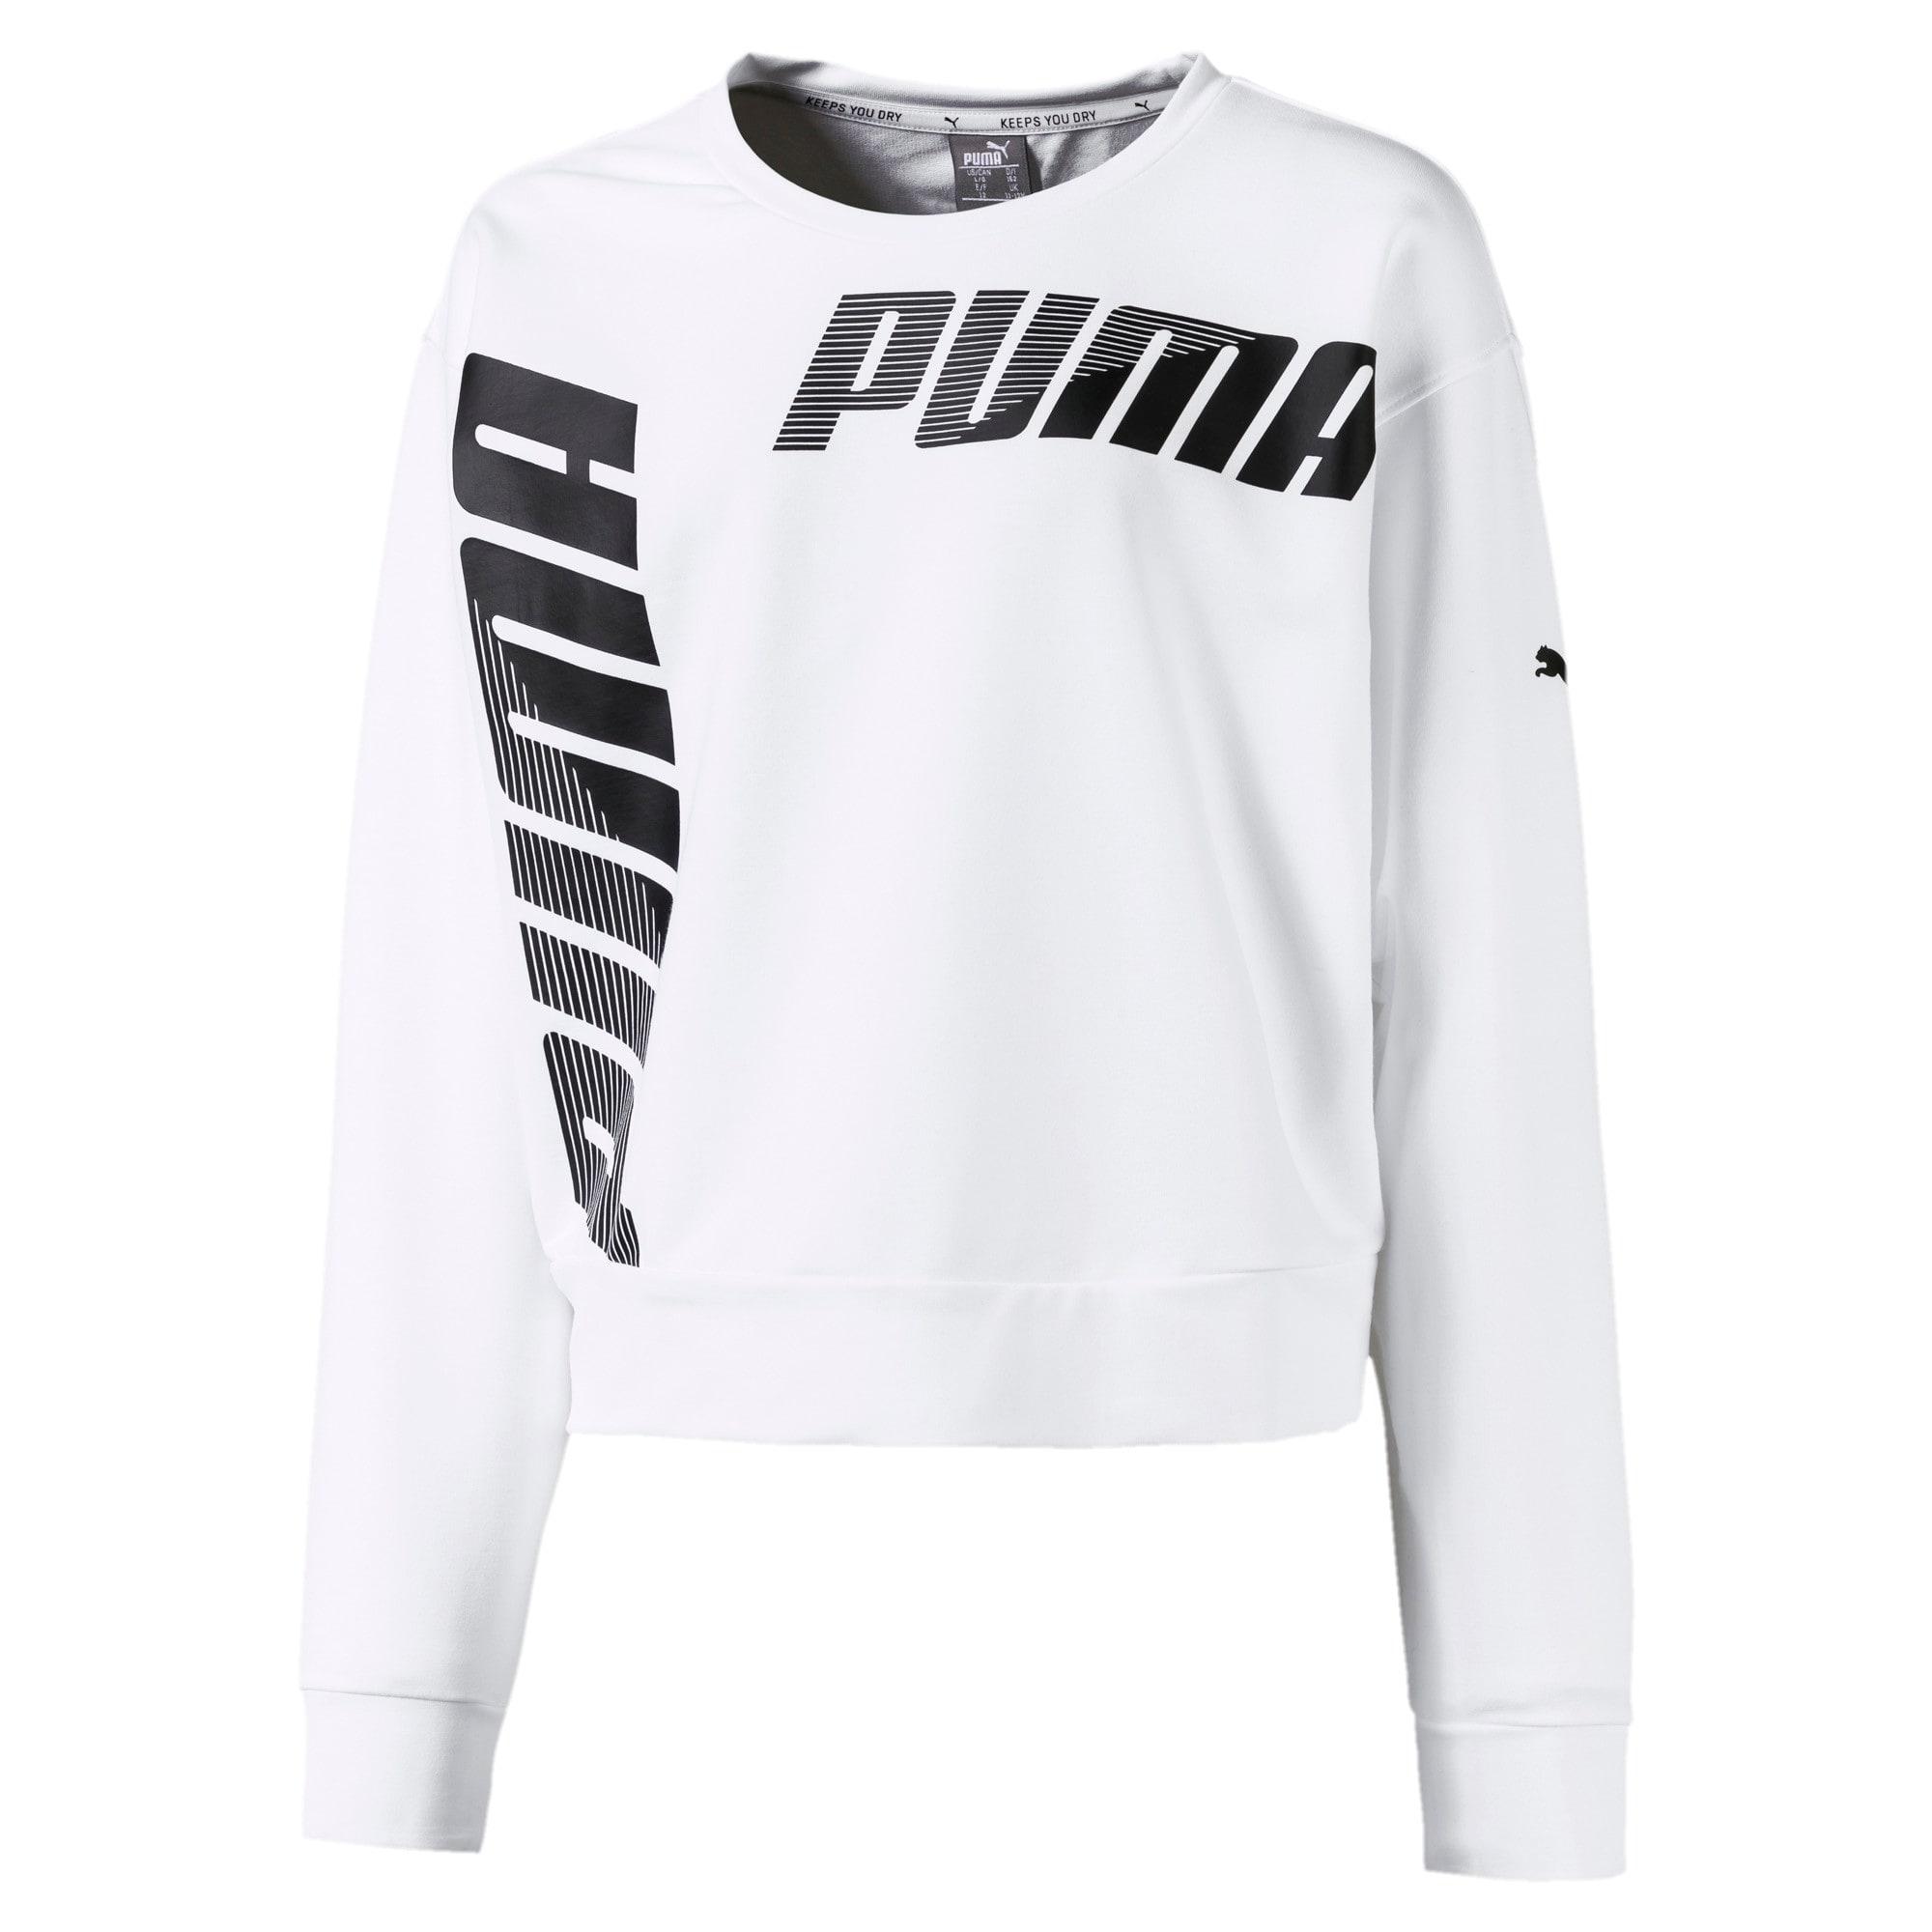 Thumbnail 1 of Modern Sports Crew Girls' Sweater, Puma White, medium-IND